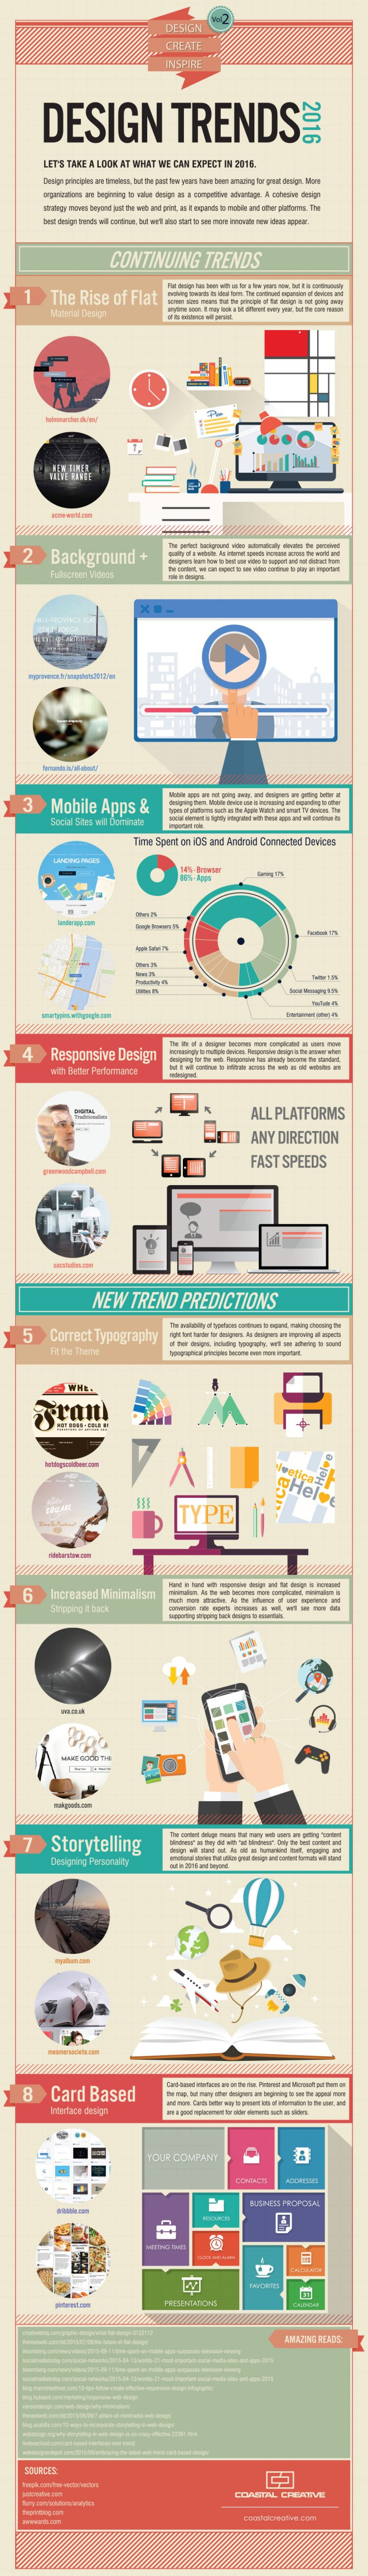 ucreative-design-trends-2016-infographic